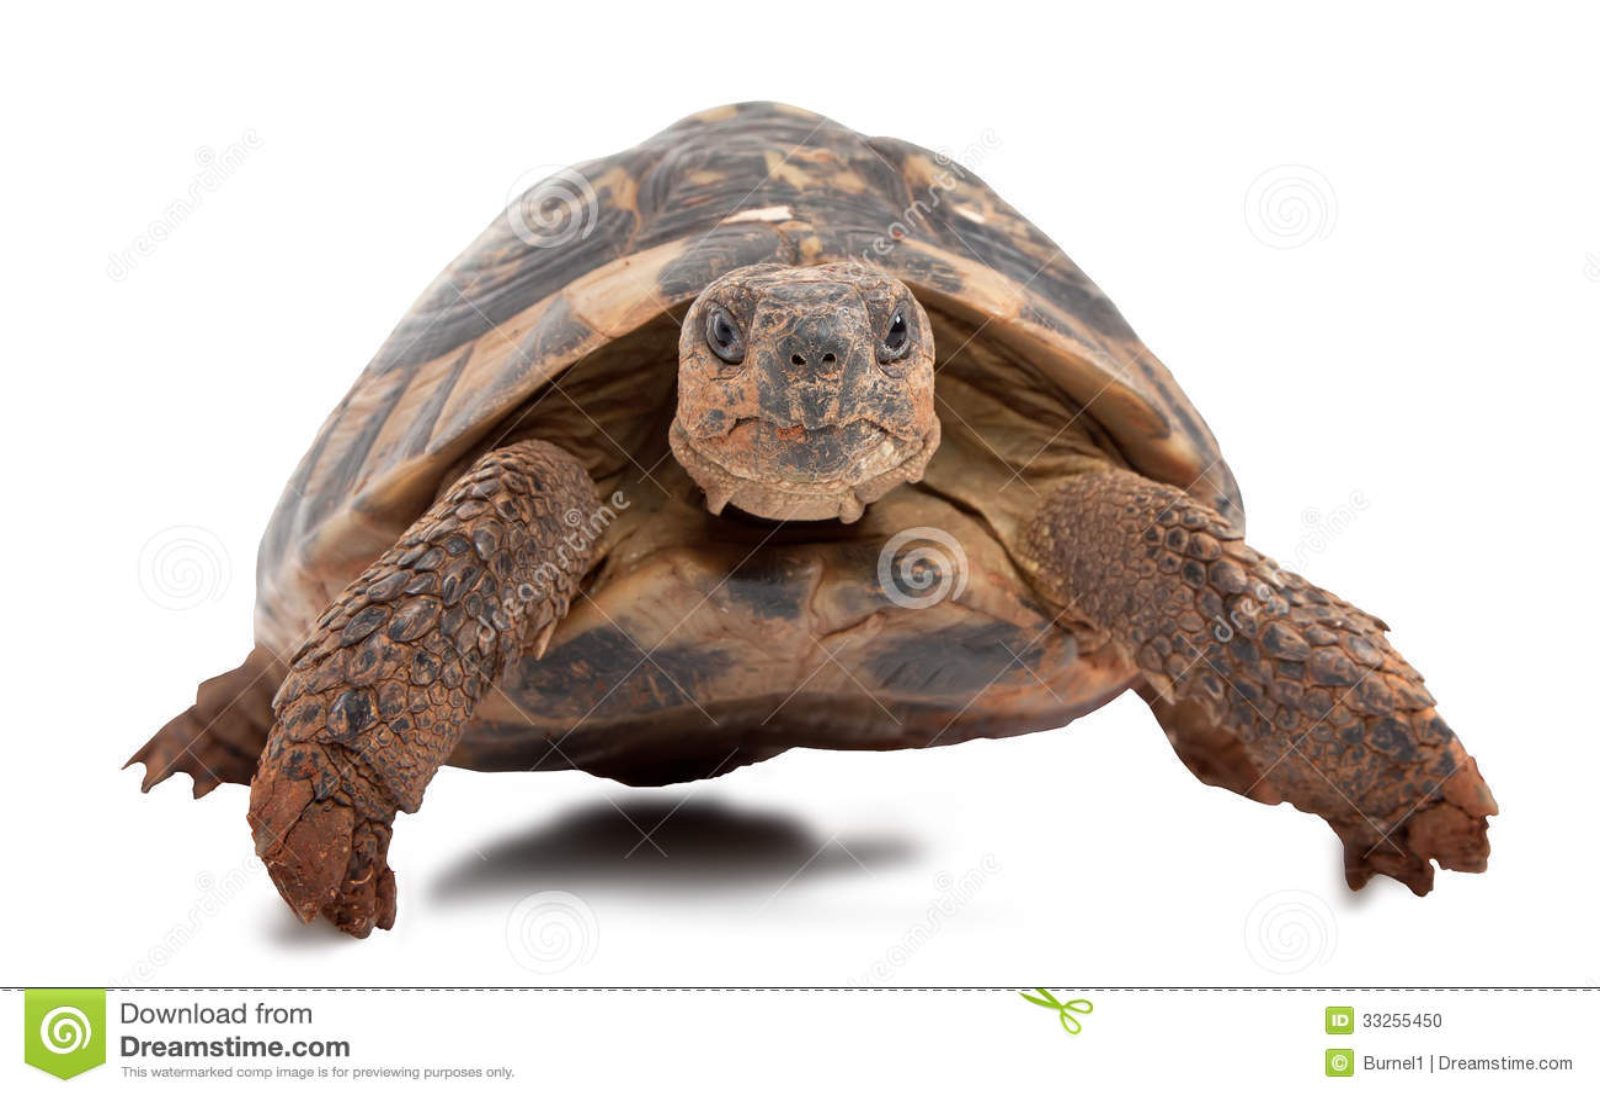 turtle white background - photo #45